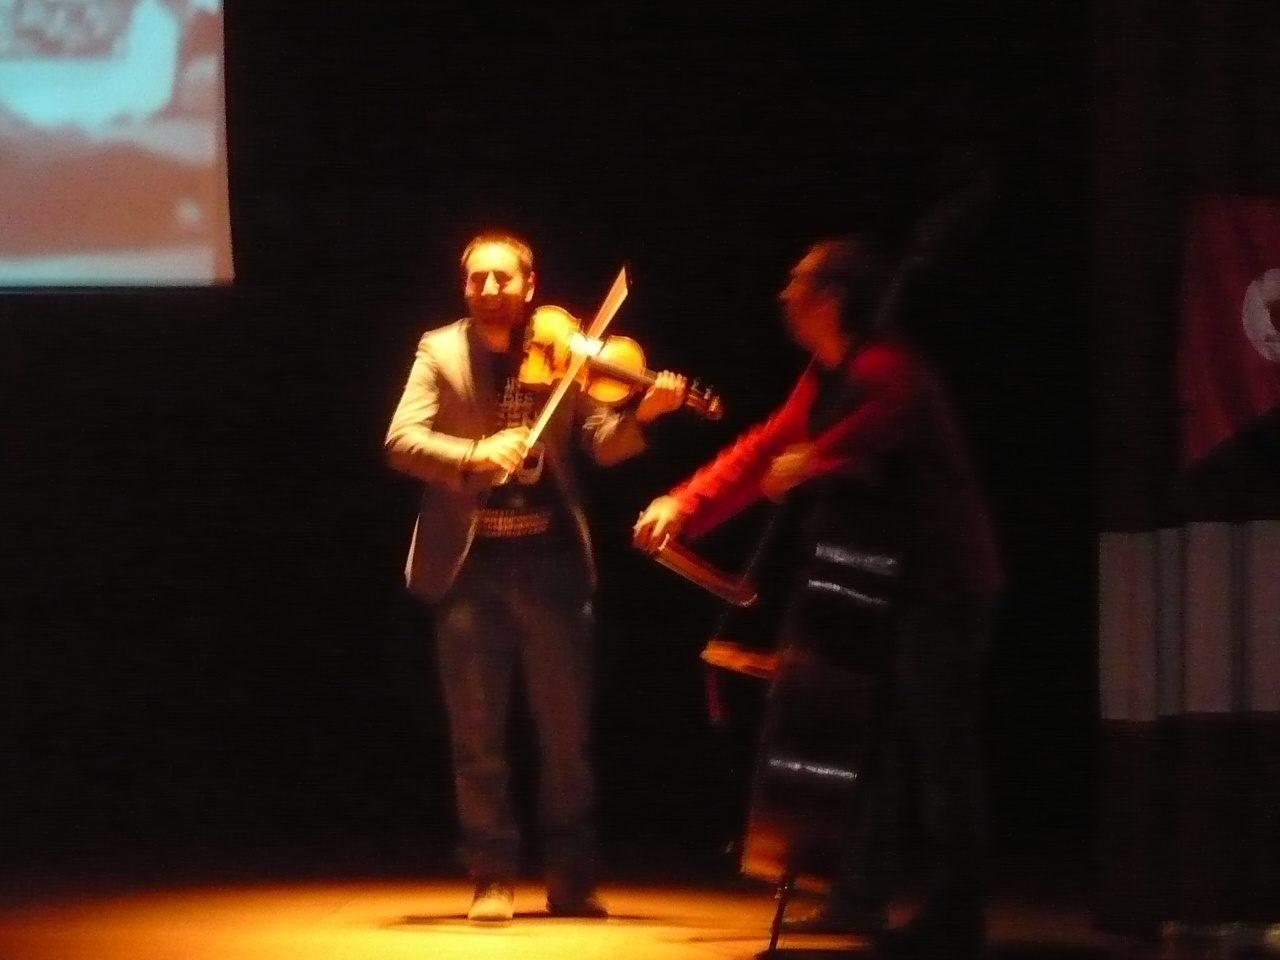 Teatro pucelini 09/11/2013